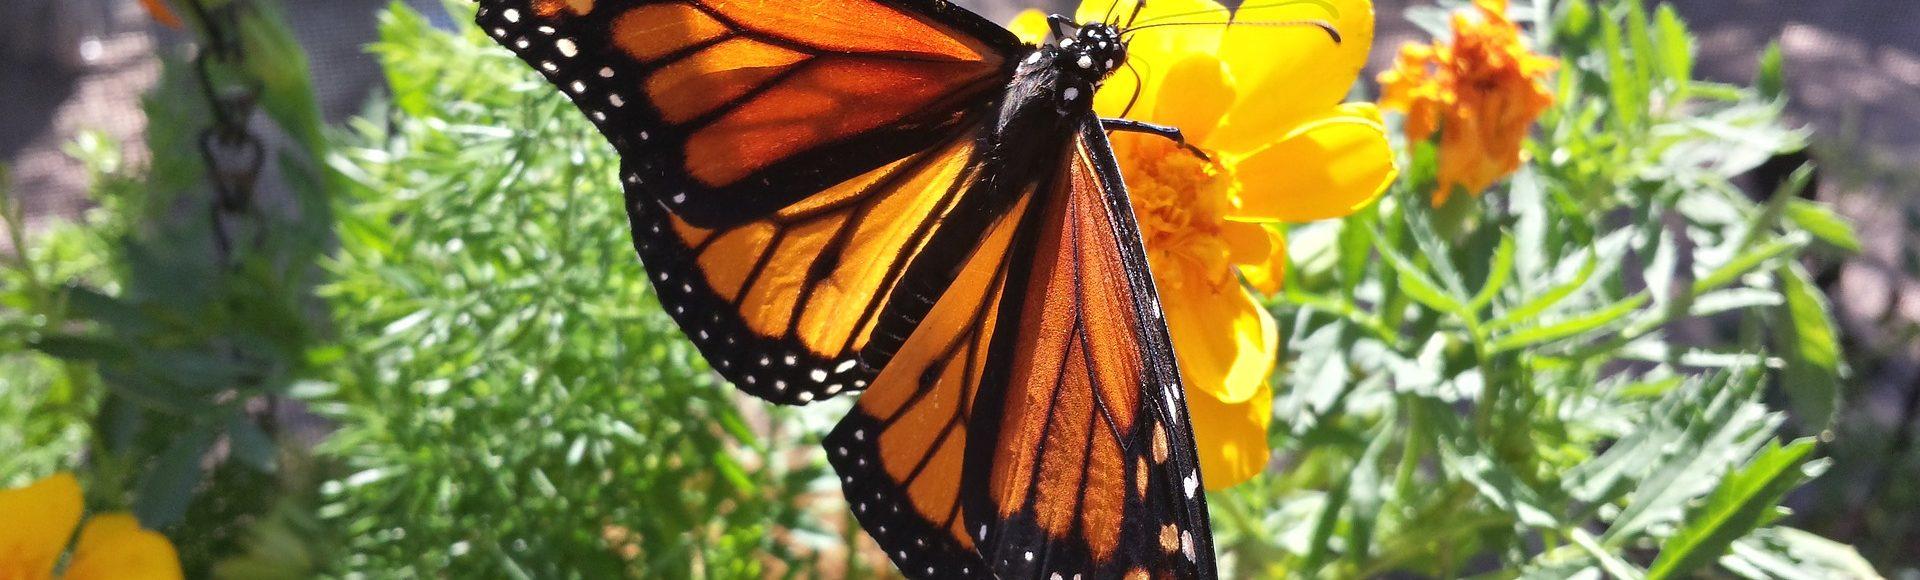 Celebrate National Pollinator Week June 19-25